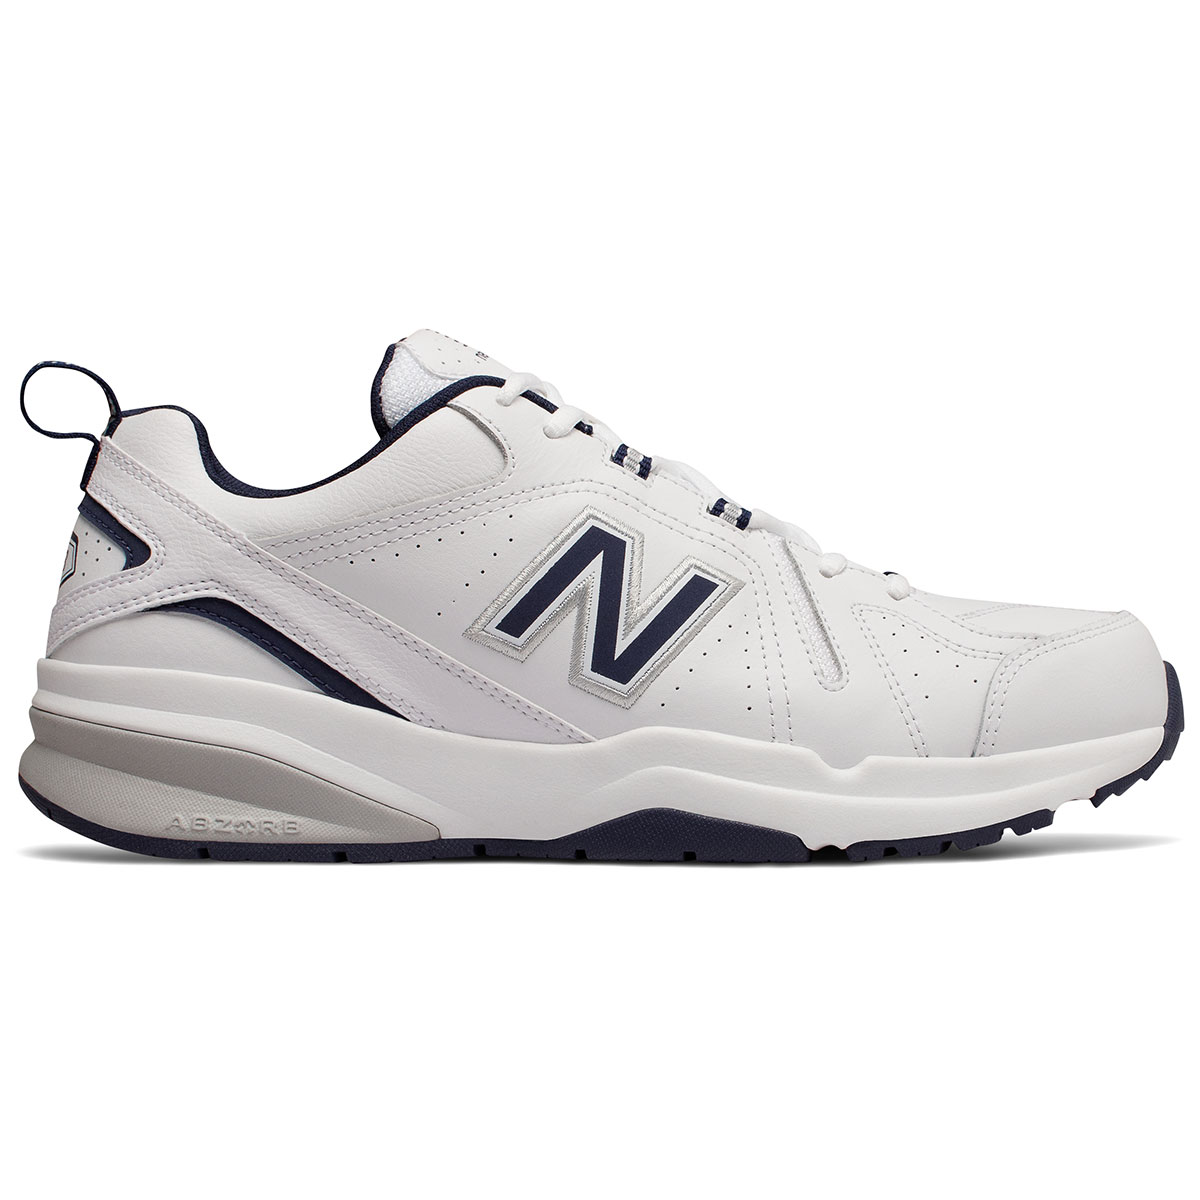 New Balance Men's 608V5 Training Shoes, Medium - White, 7.5